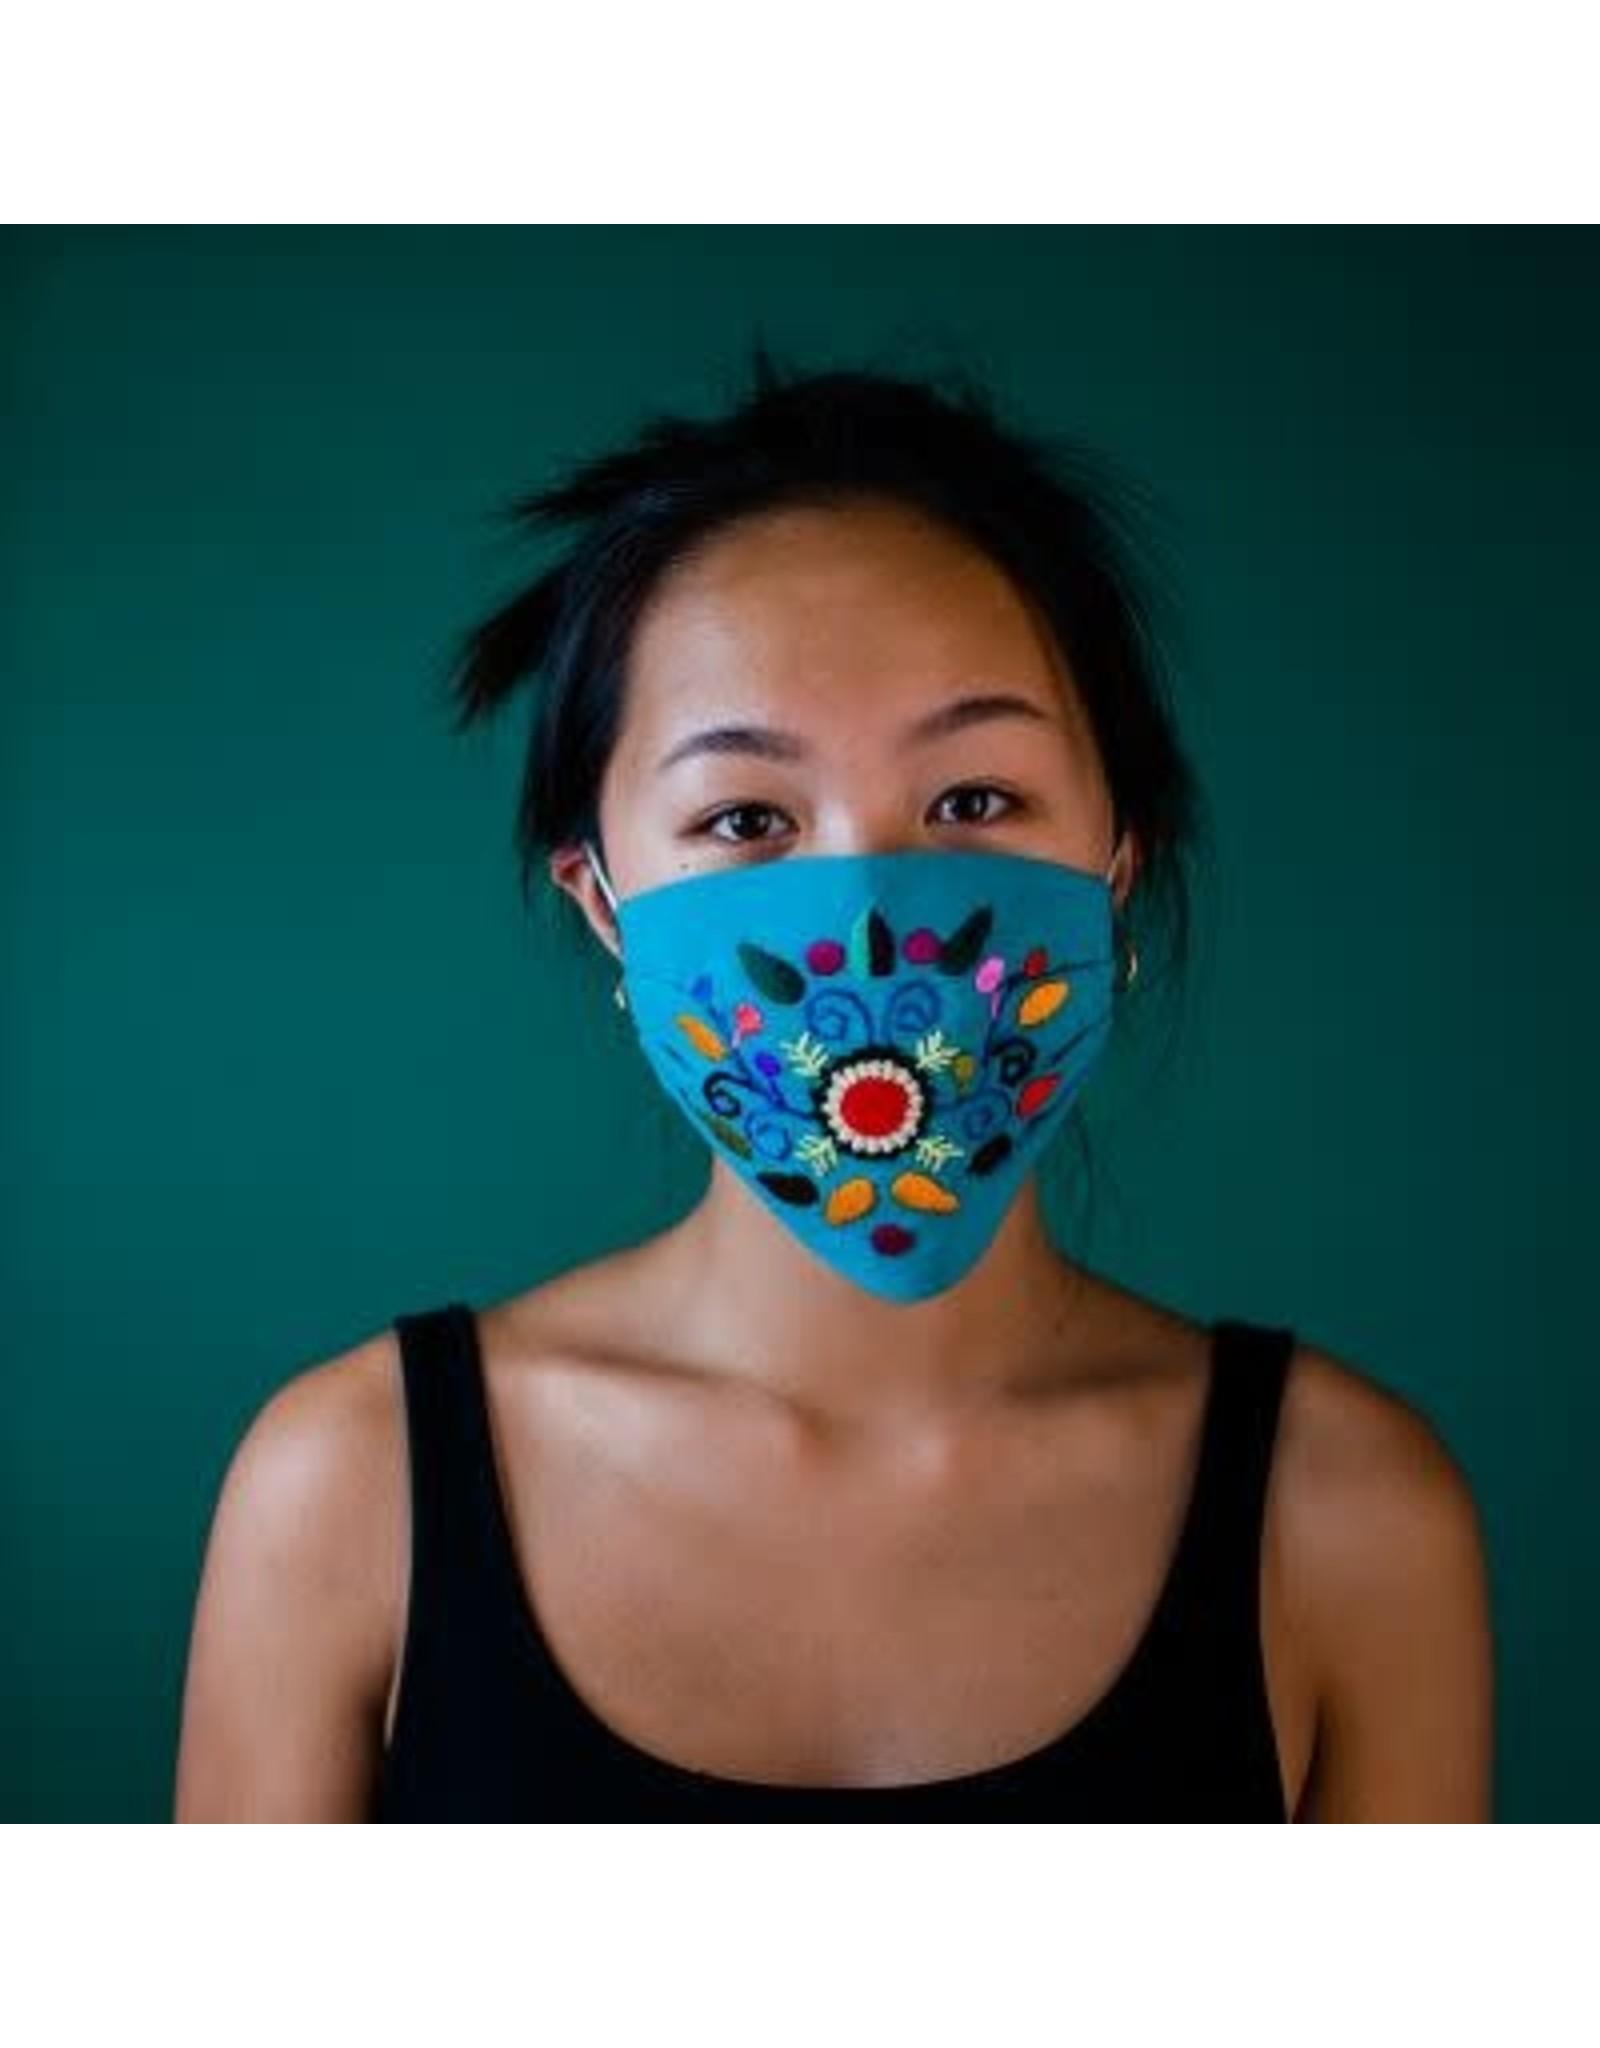 Duckbill Embroidered Mask w/ Pocket, Adult